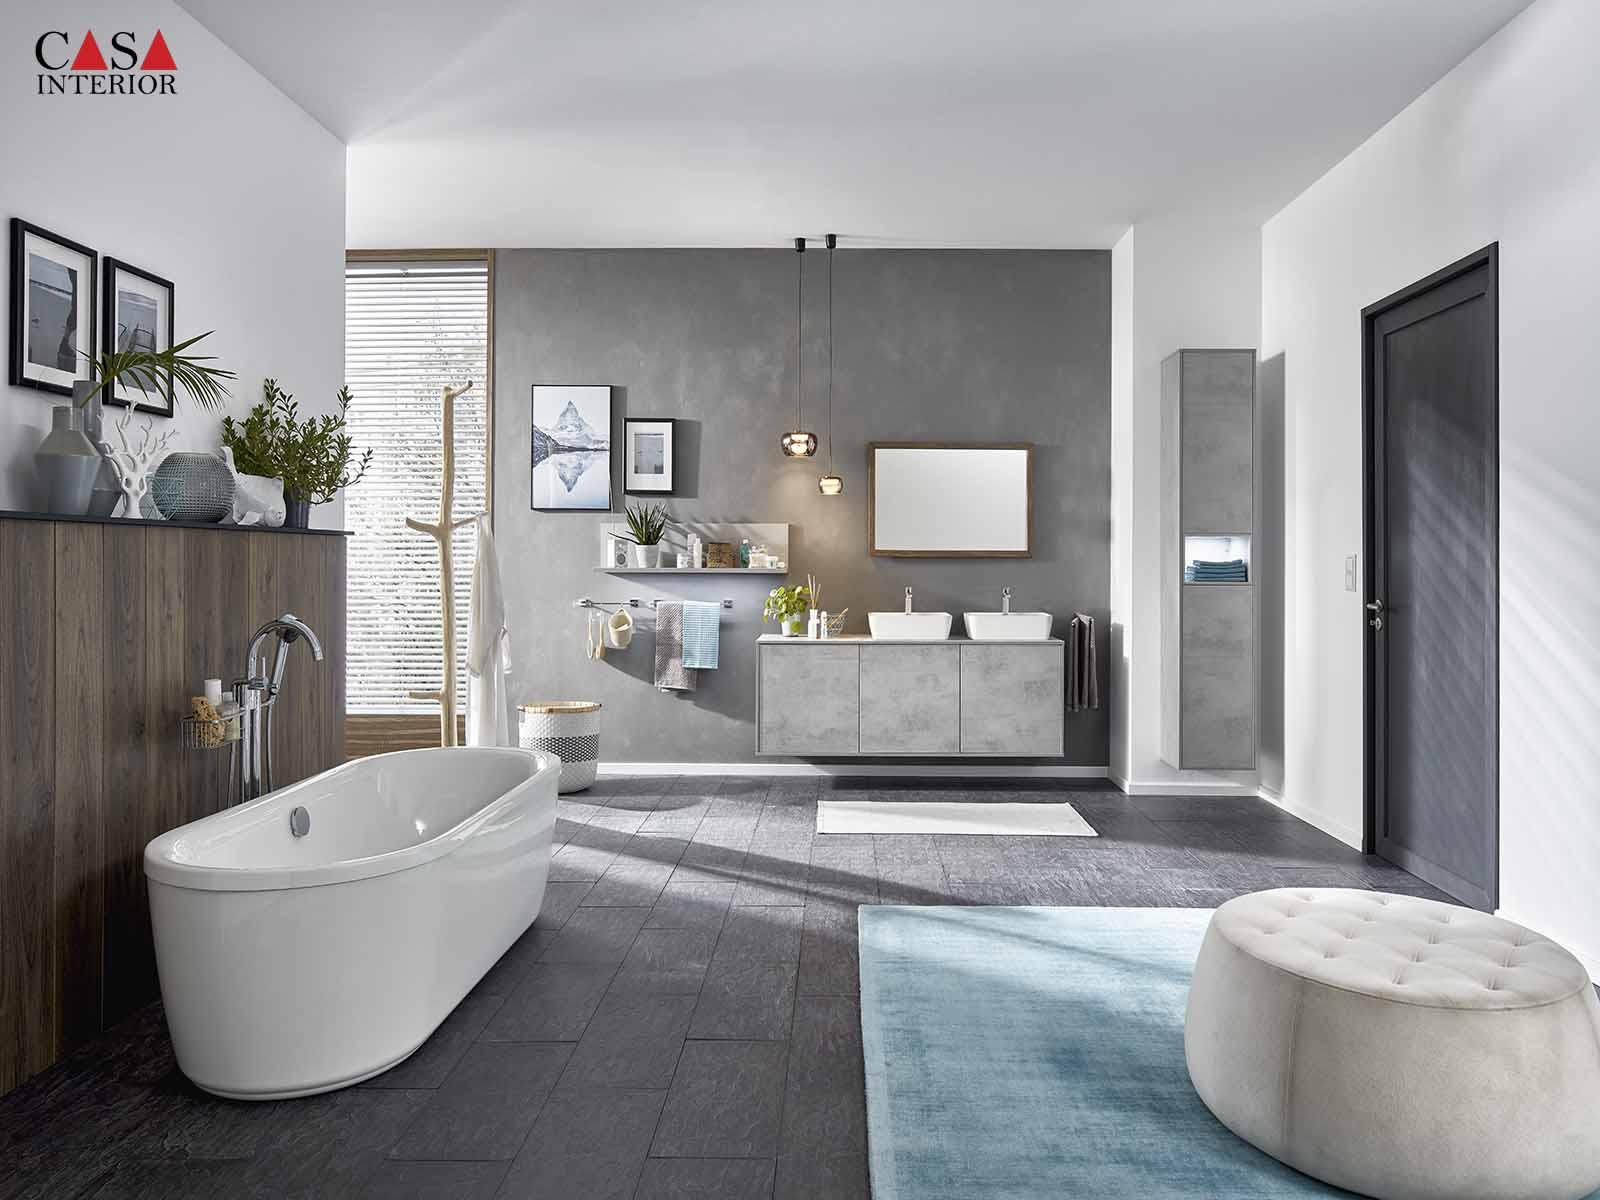 Küchentime Riva Concrete grey reproduction 892 - Bathroom